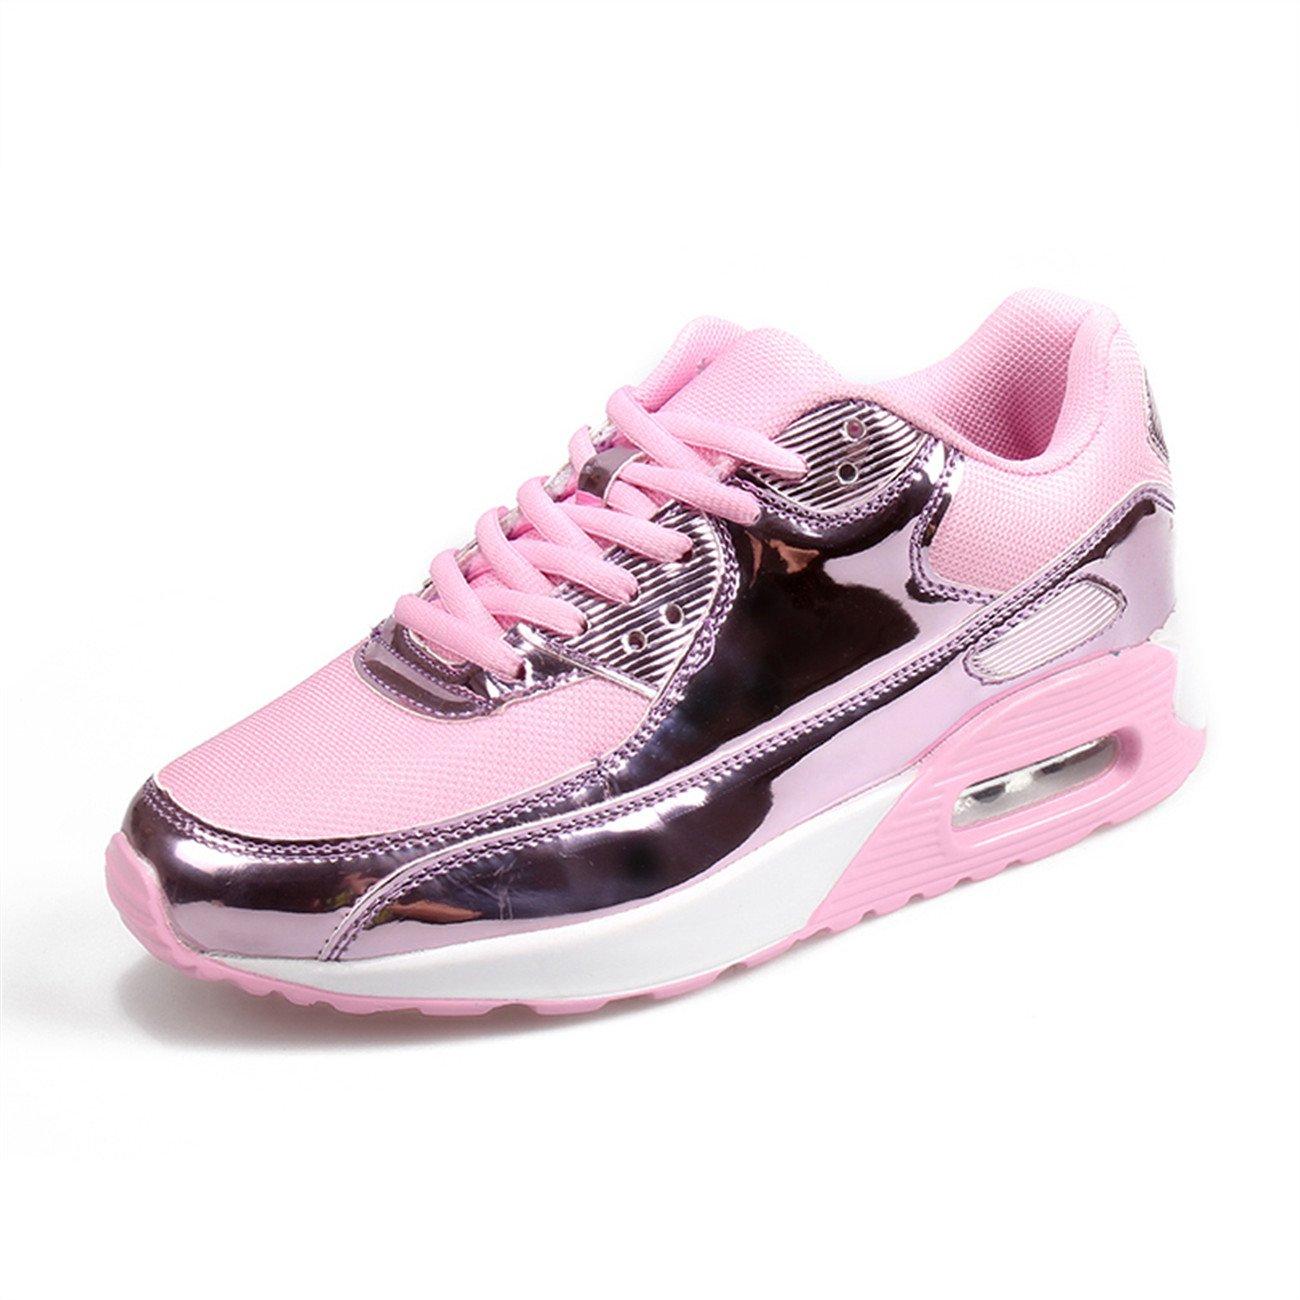 XINGLAN Men Women Unisex Couple Casual Running Sneakers Breathable Athletic Air Cushion Sports Shoes B073QVQ5B8 Women 8 B(M) US / Men 6.5 D(M) US|Pink